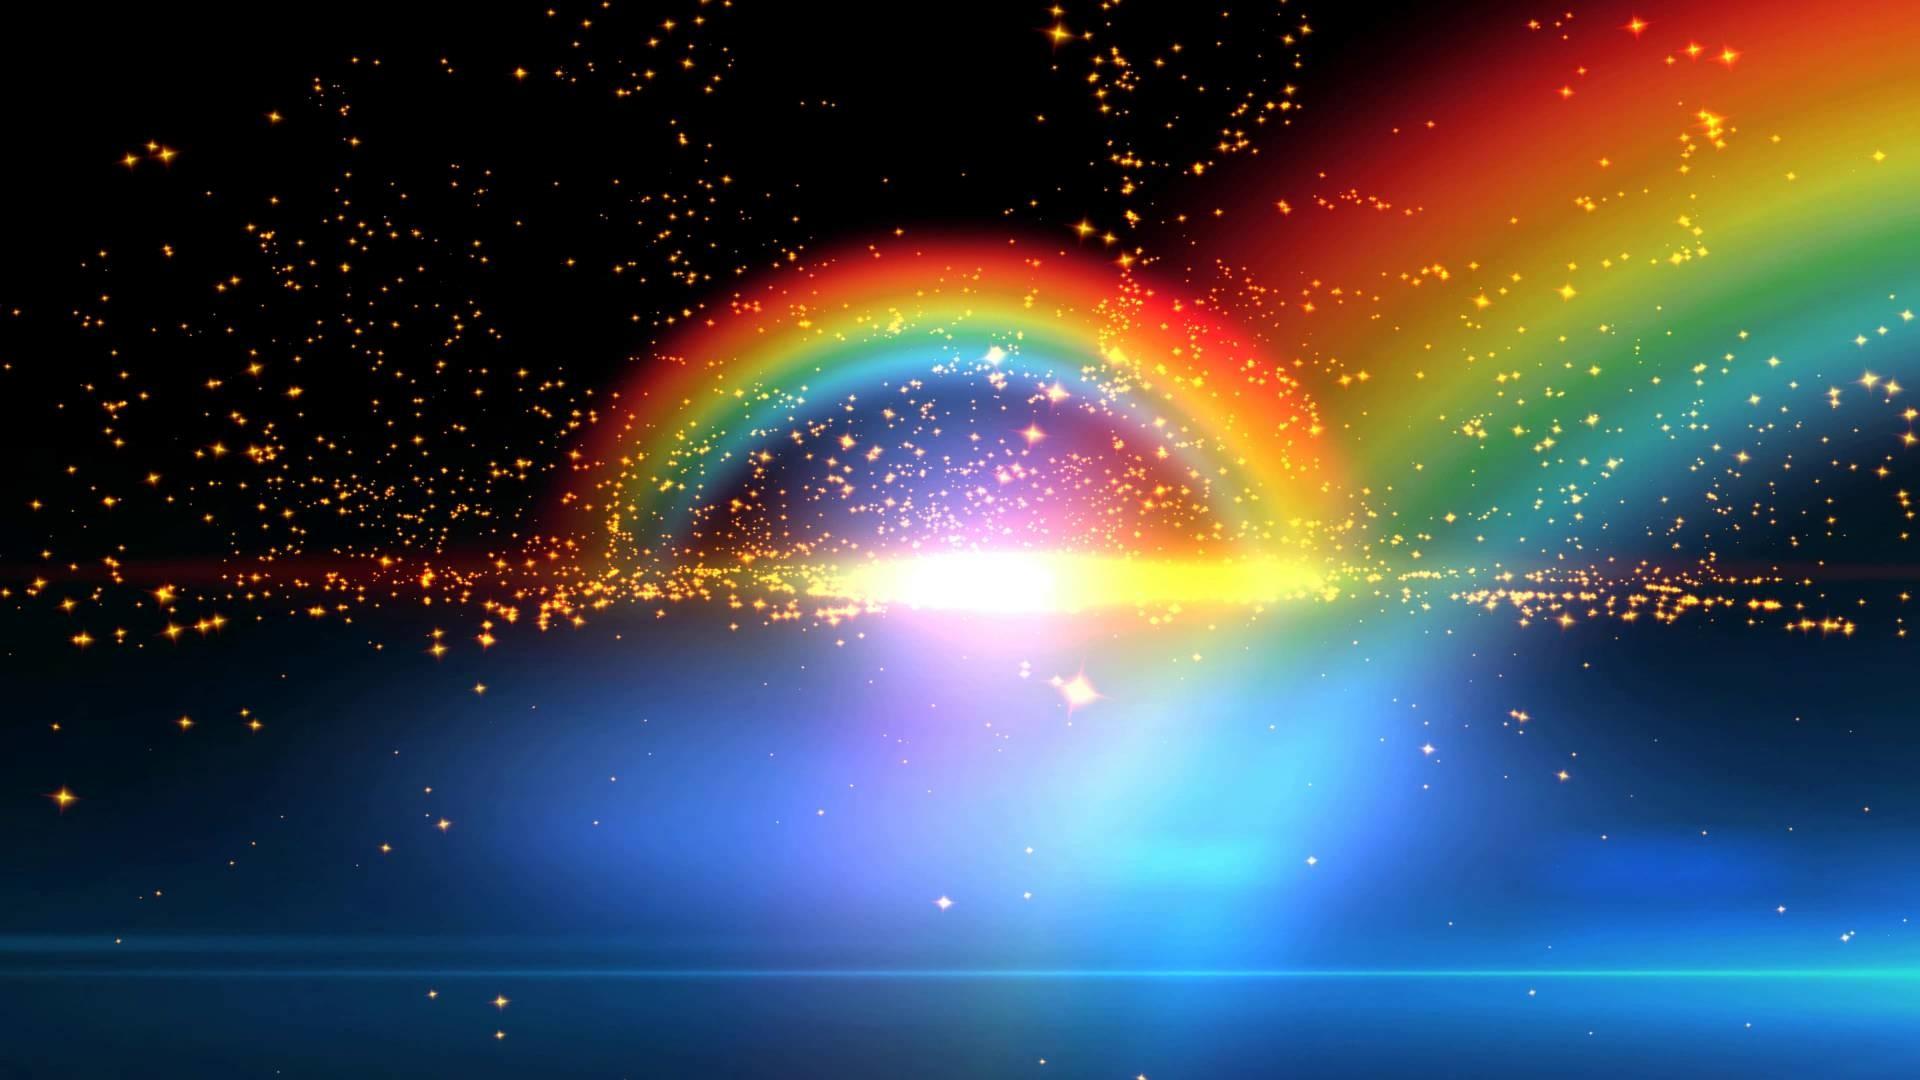 Double Rainbow Wedding Photo Is Breathtakingly Beautiful ...  |Double Rainbow Wallpaper